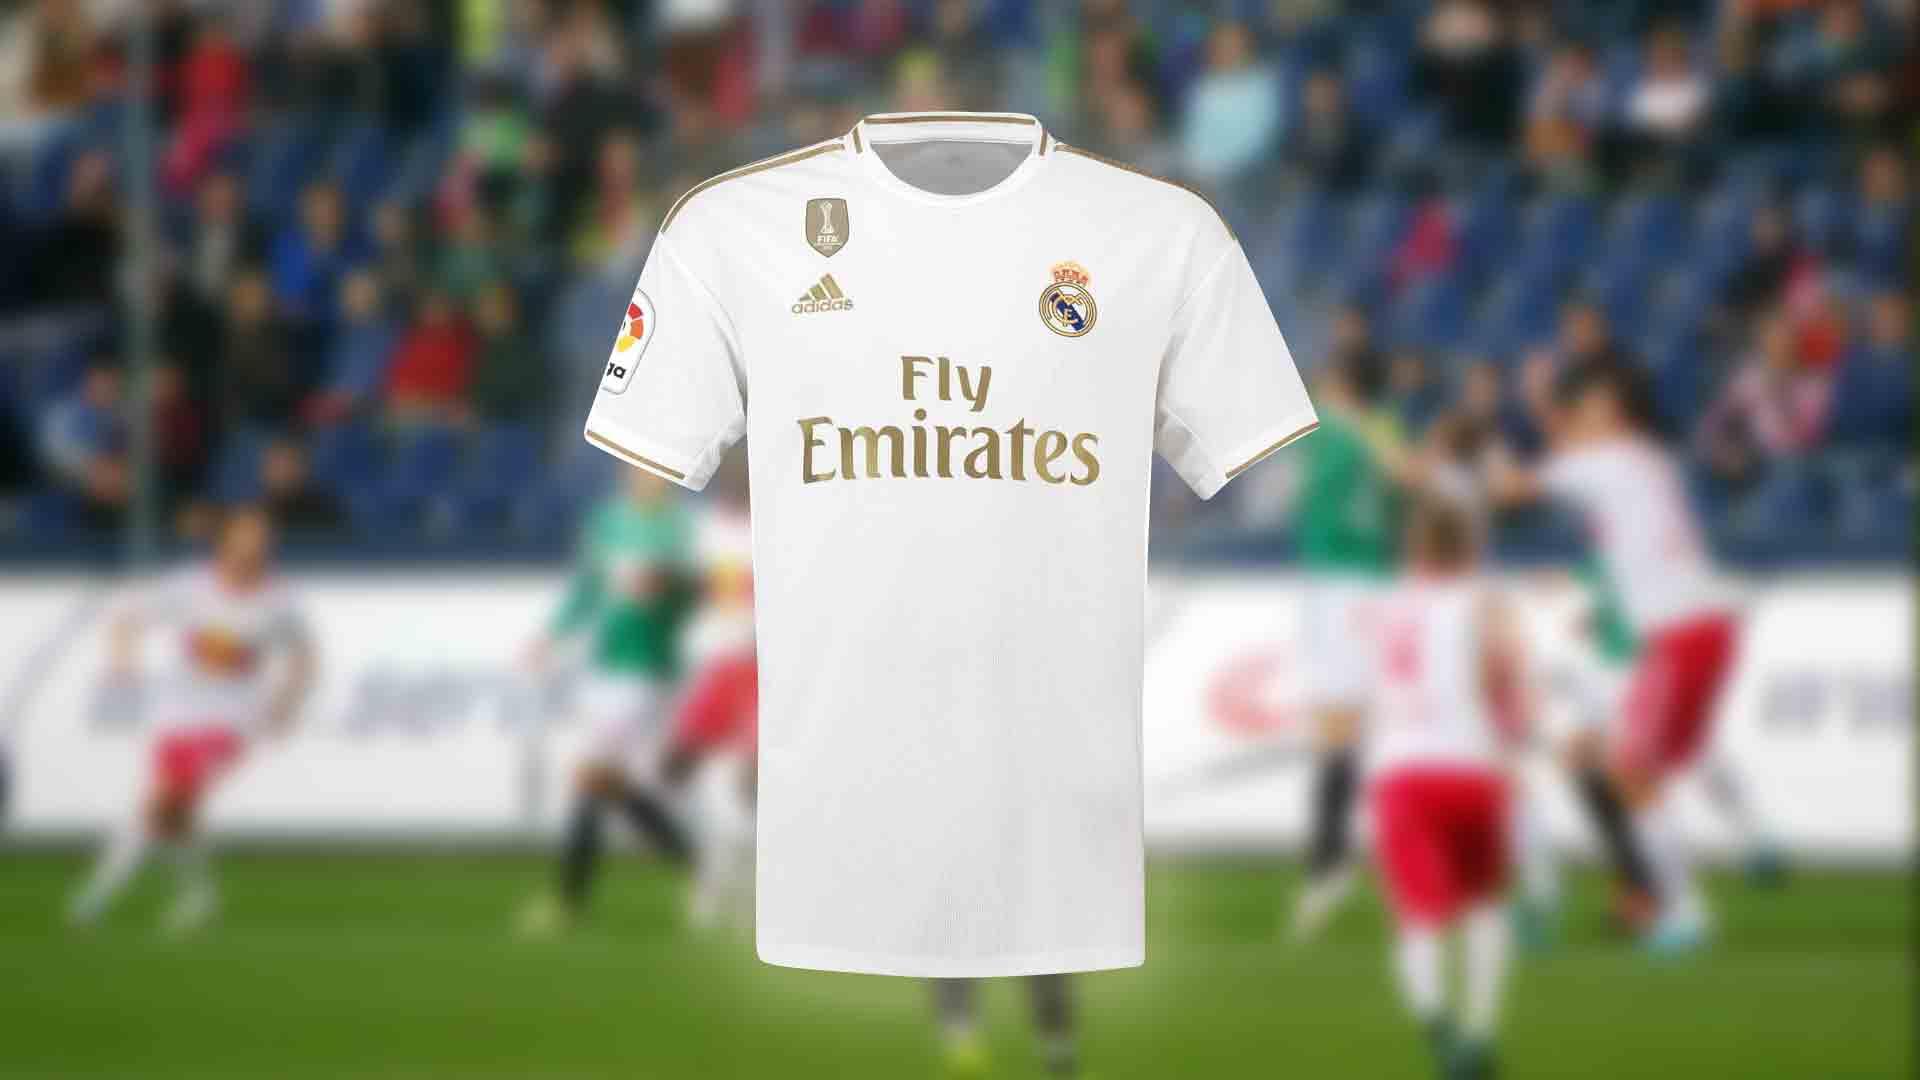 Dream League Soccer Real Madrid Kits And Logos 2019 2020 512x512